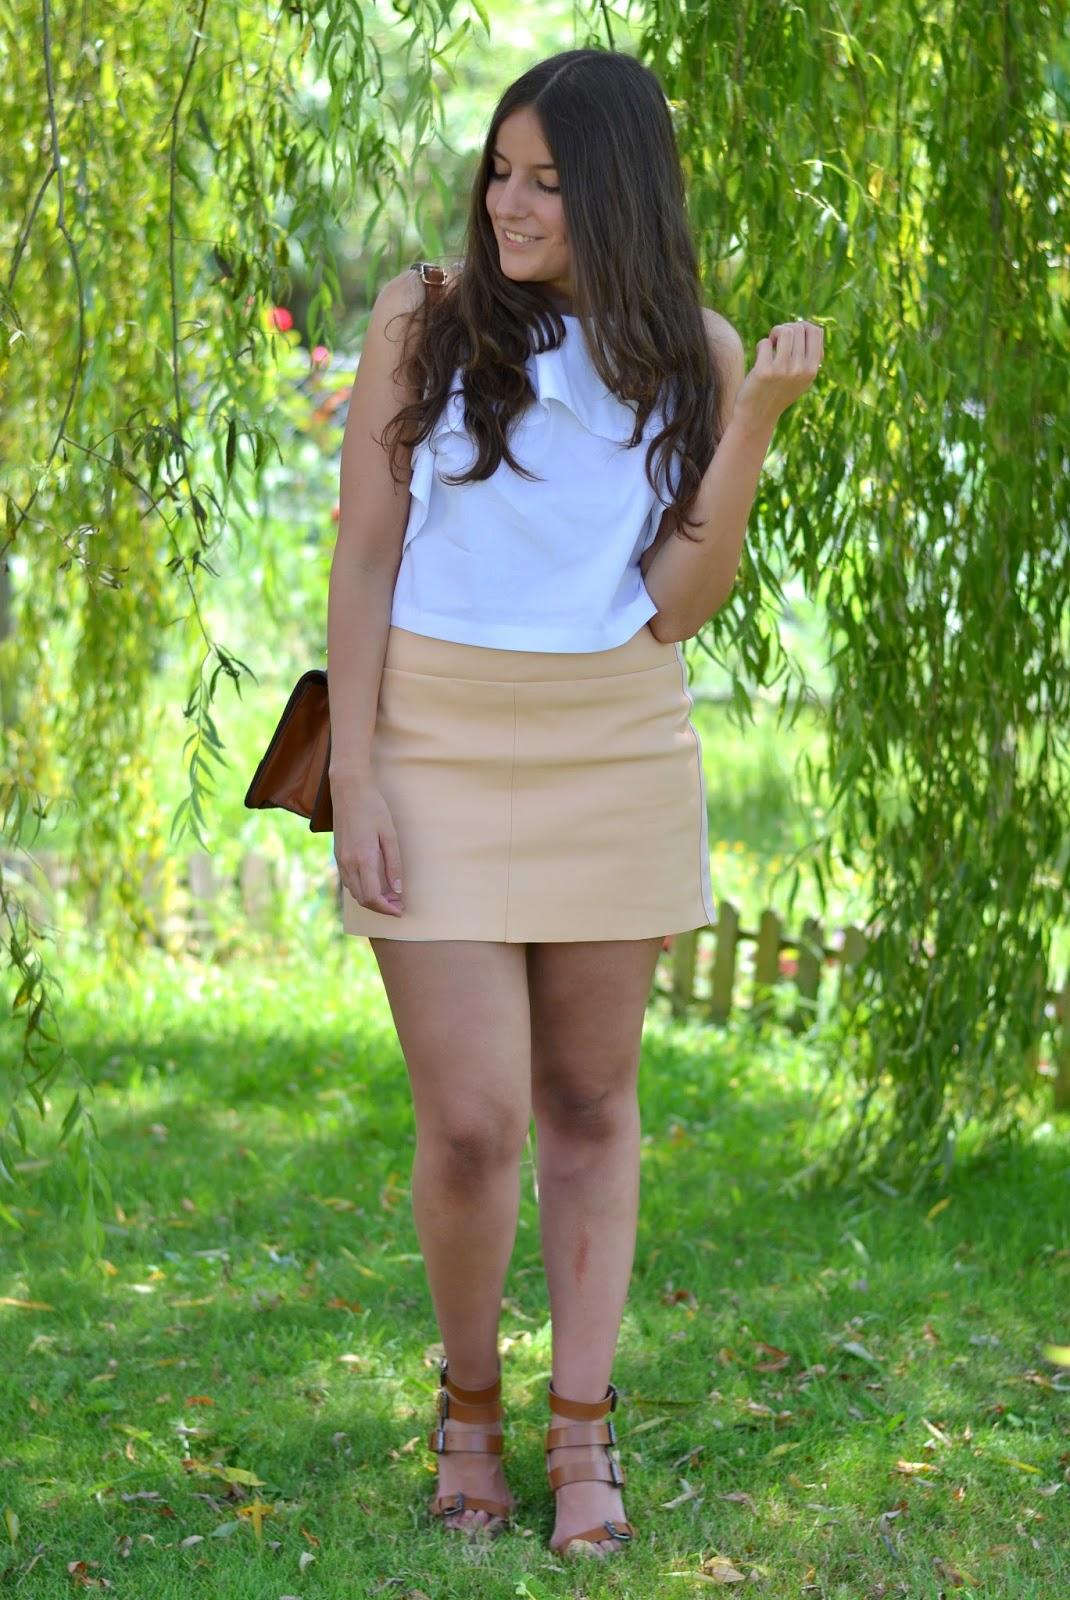 falda melocotón polipel zara, sandalias bolso camel, top blanco